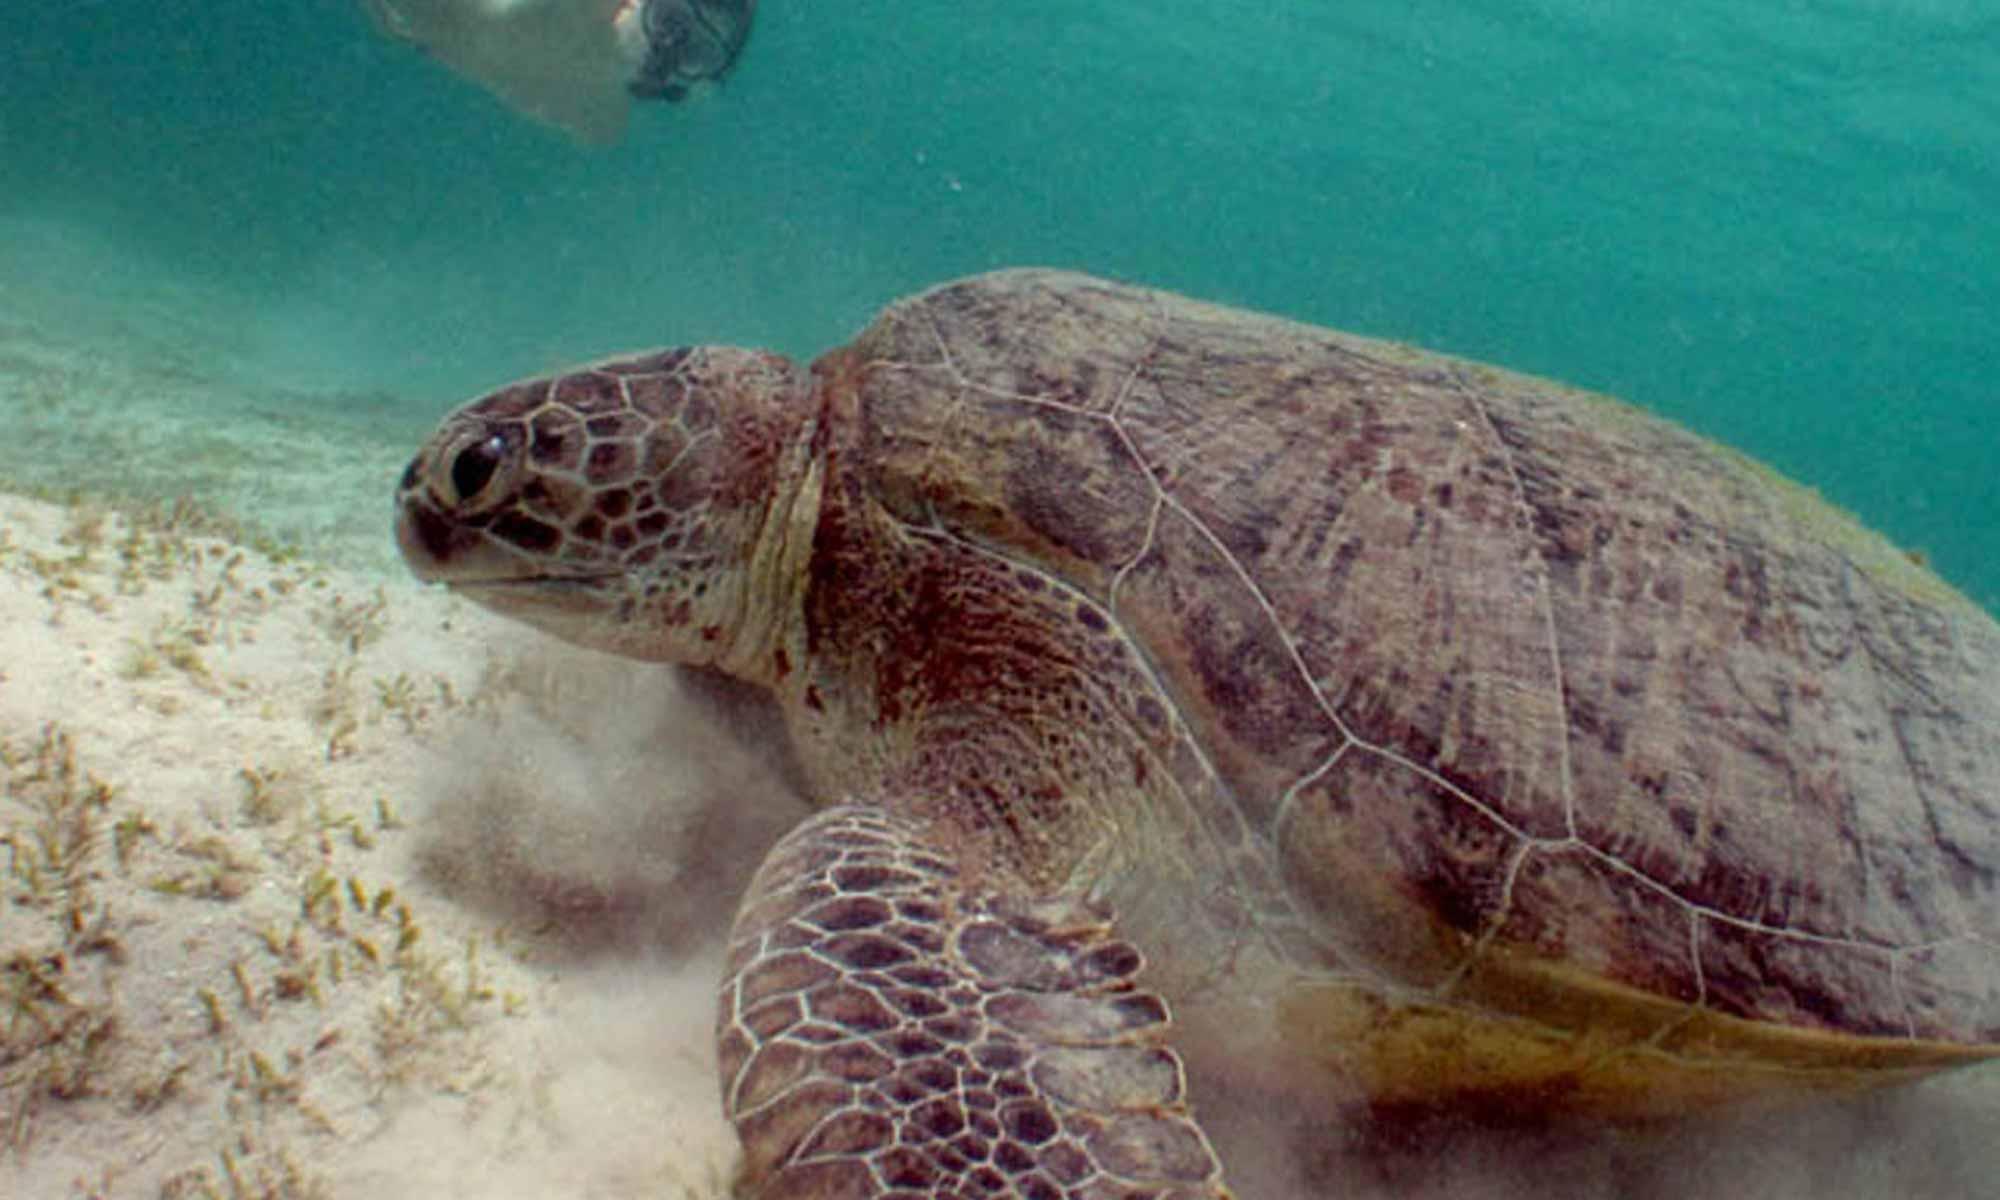 Slow Dive Rotes Meer Ägypten Emperor Divers Marsa Alam Schildkröte